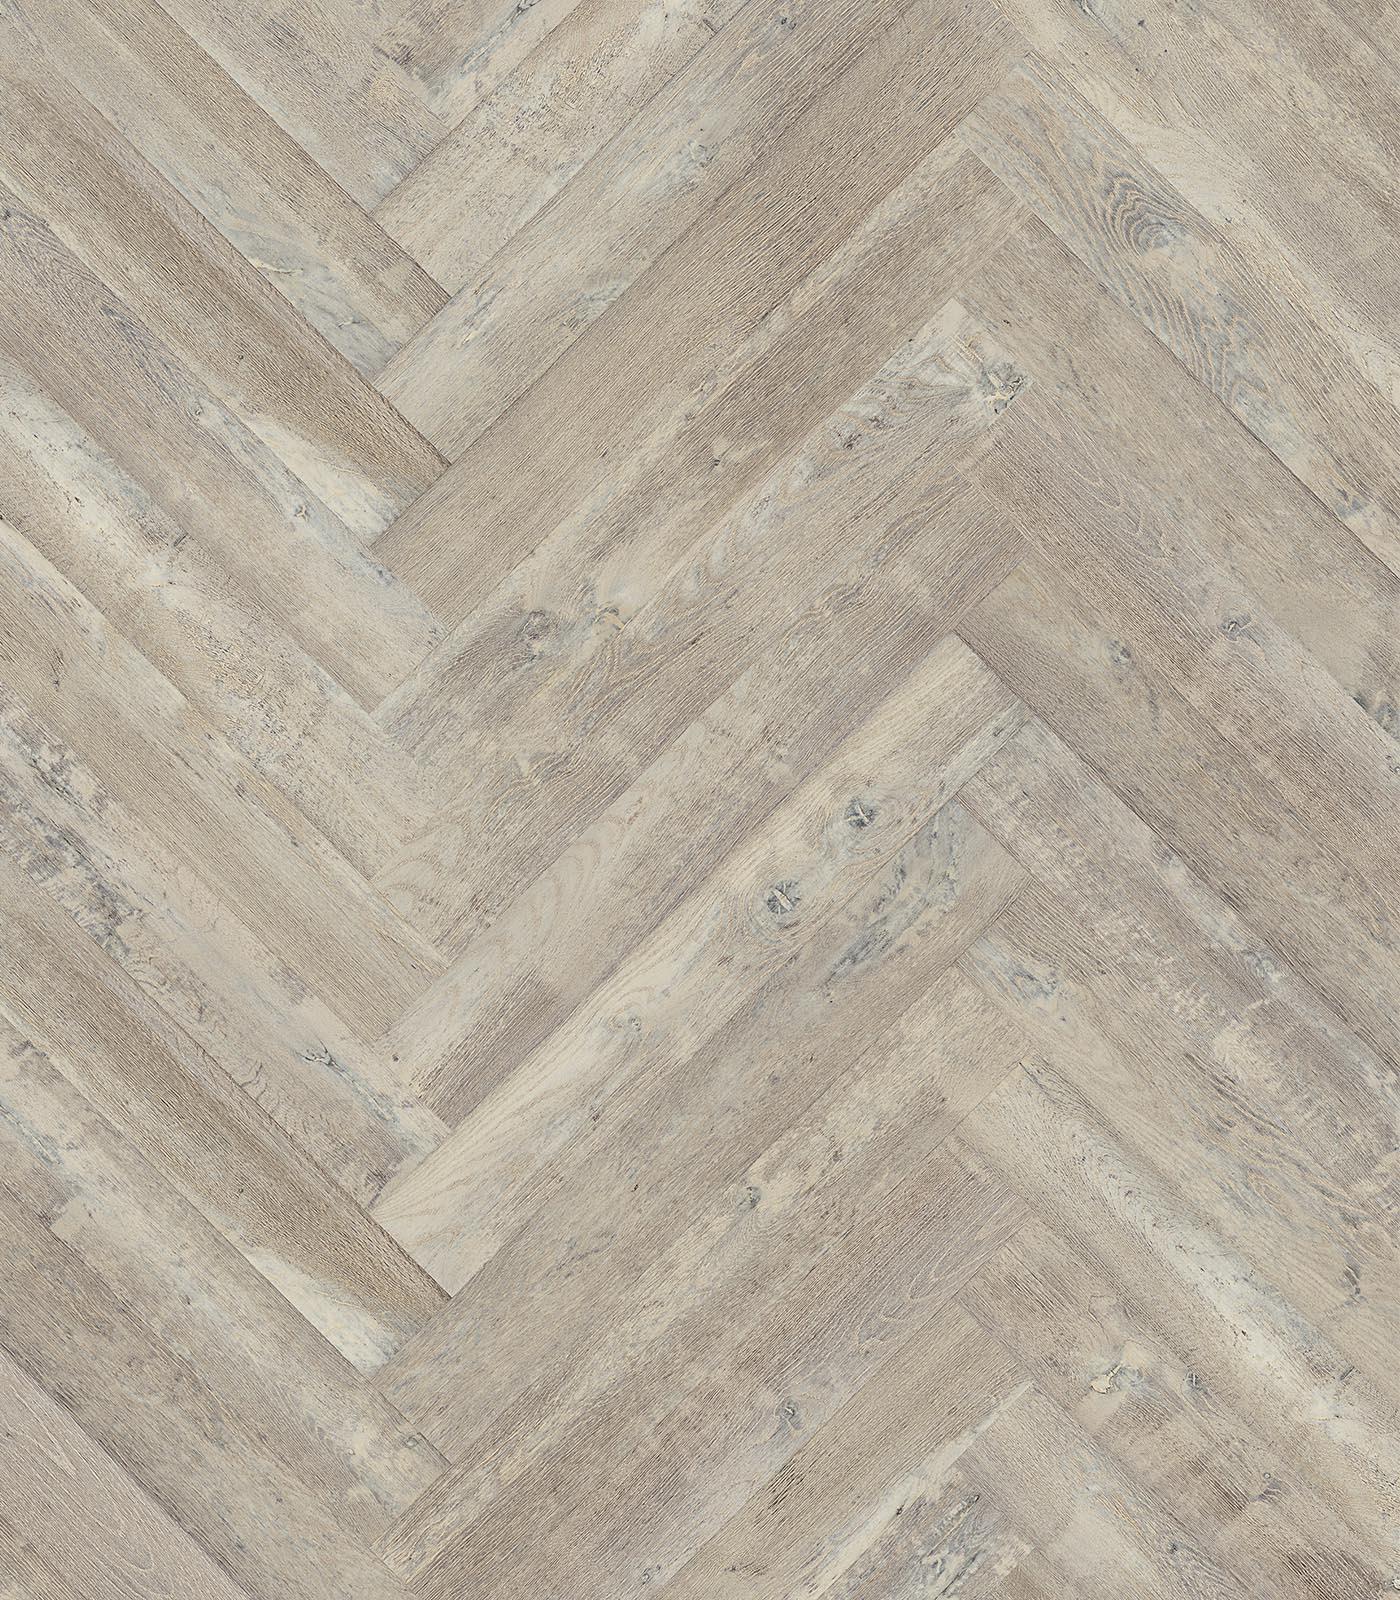 Western European oak flooring-Fashion Collection-Herringbone-Vail-flat